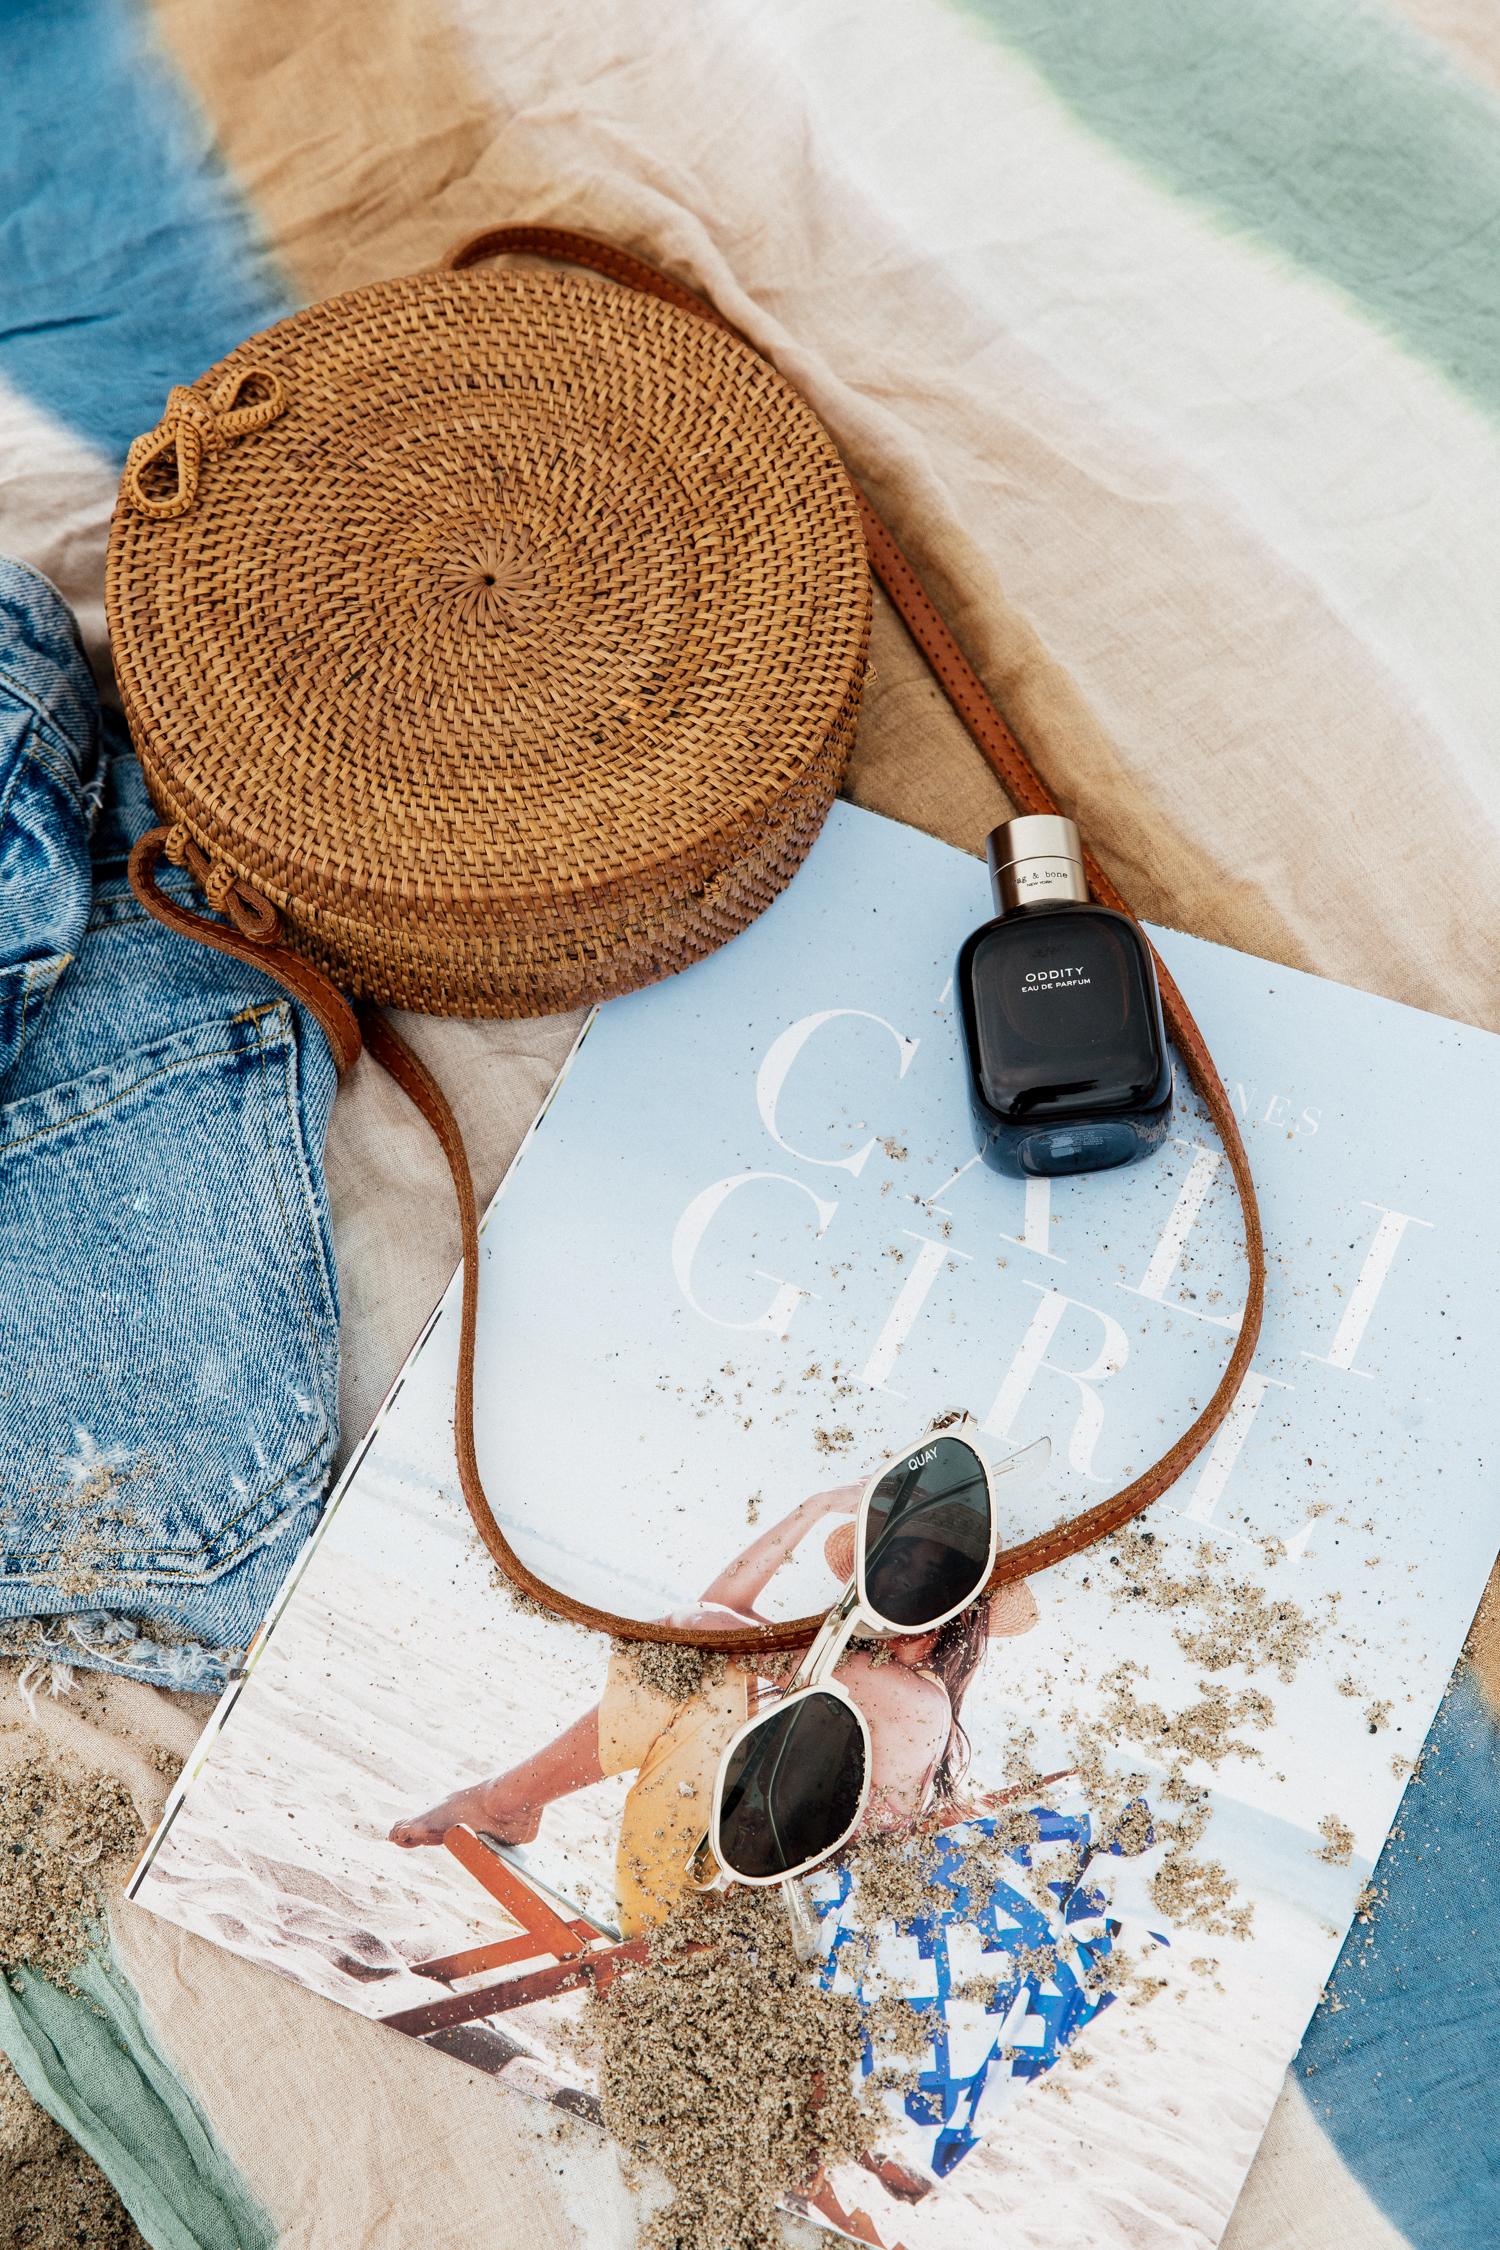 Rag + Bone Fragrance Oddity at Sephora   Everyday Pursuits Fave Summer Scent